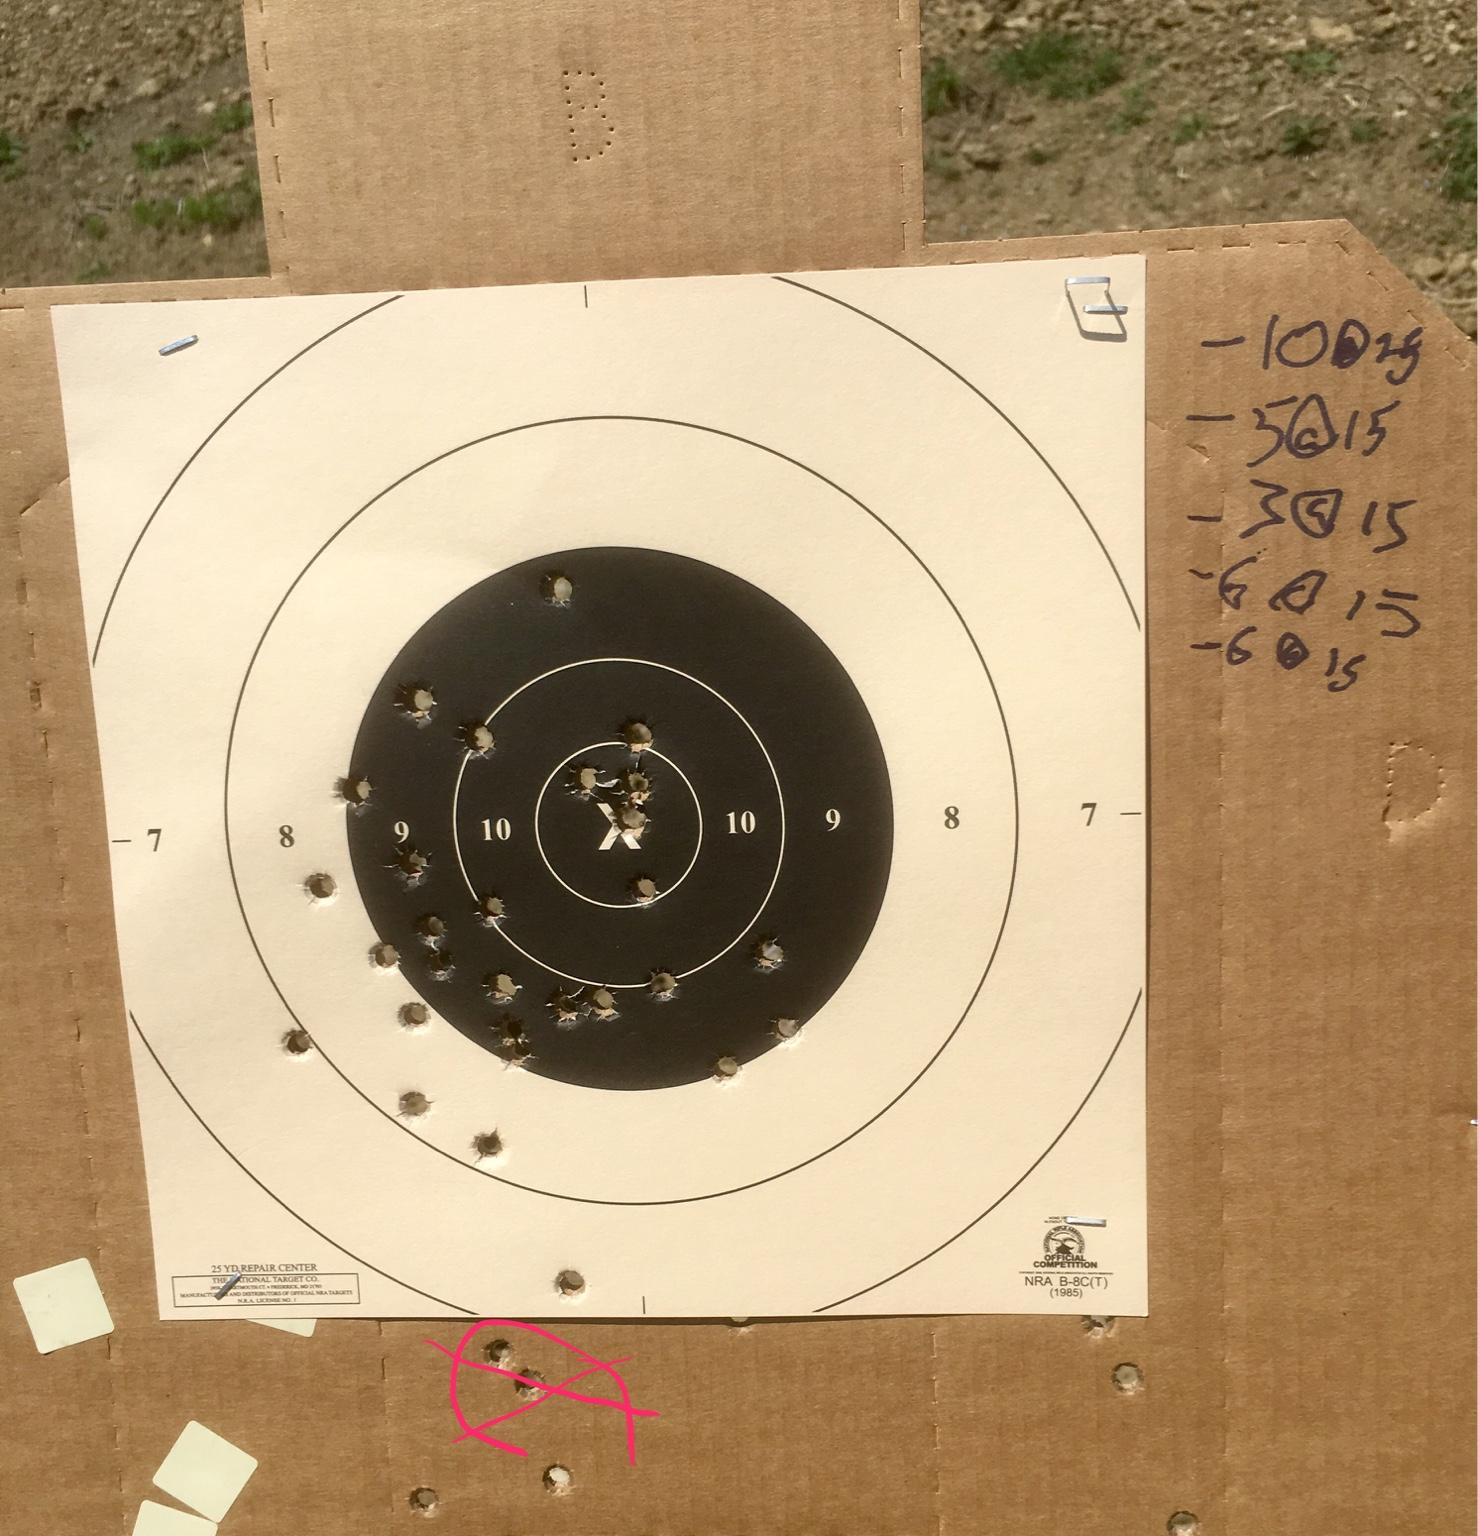 image about Nra B-8 Target Printable identify 7 days 208: FBI Bullseye System (Transformed) - Website page 4